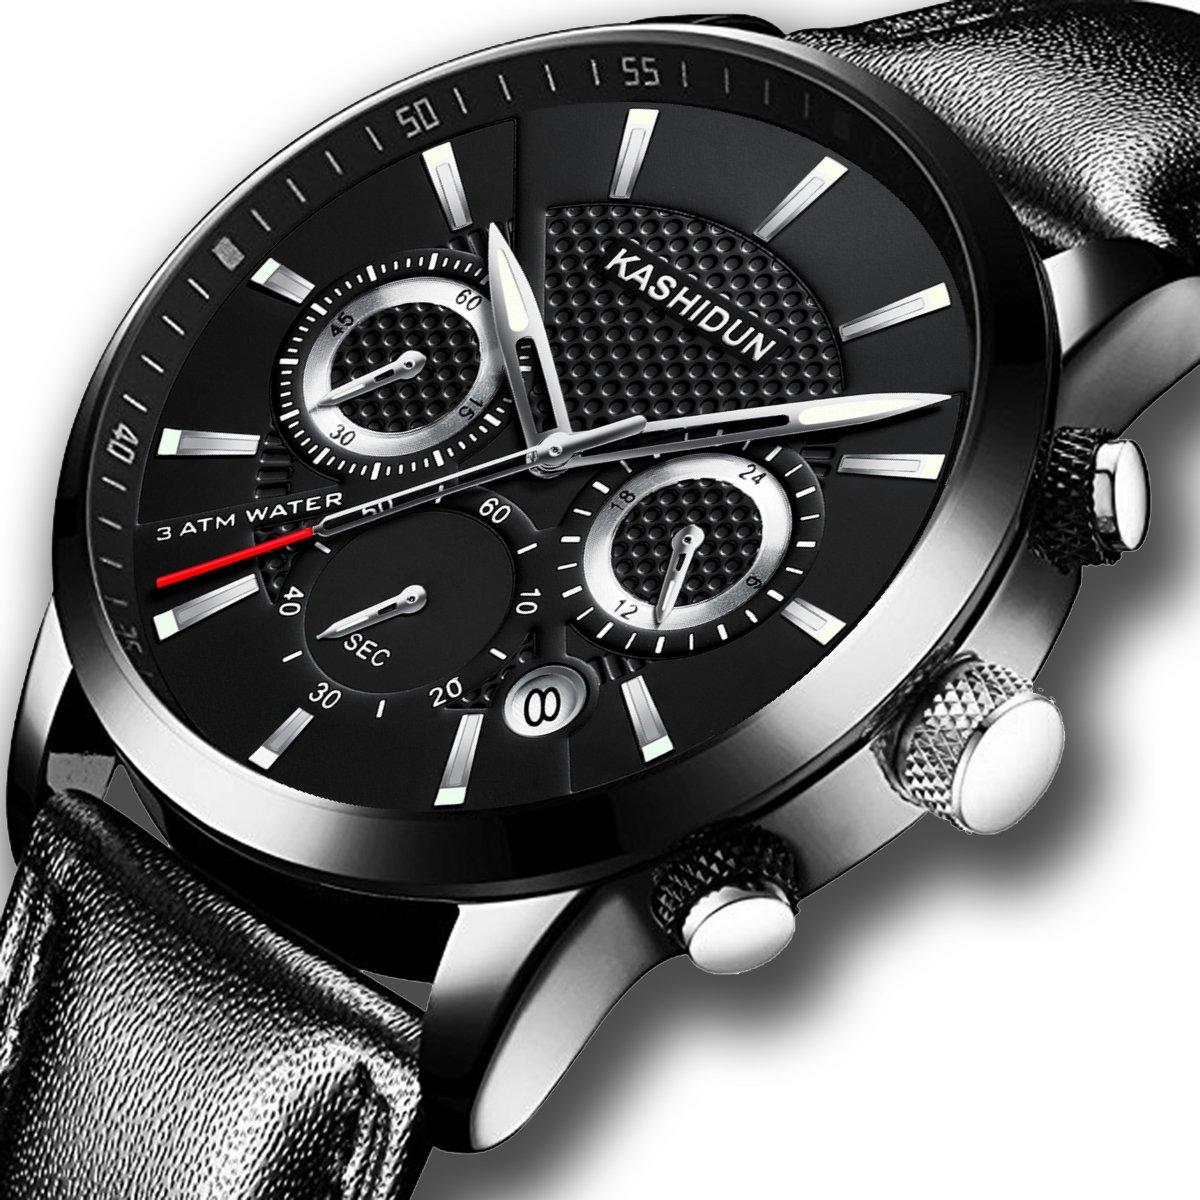 KASHIDUN Men's Watches Sports Military Army Quartz Wristwatch Chronograph Calendar Date Leather Strap Black Color by KASHIDUN